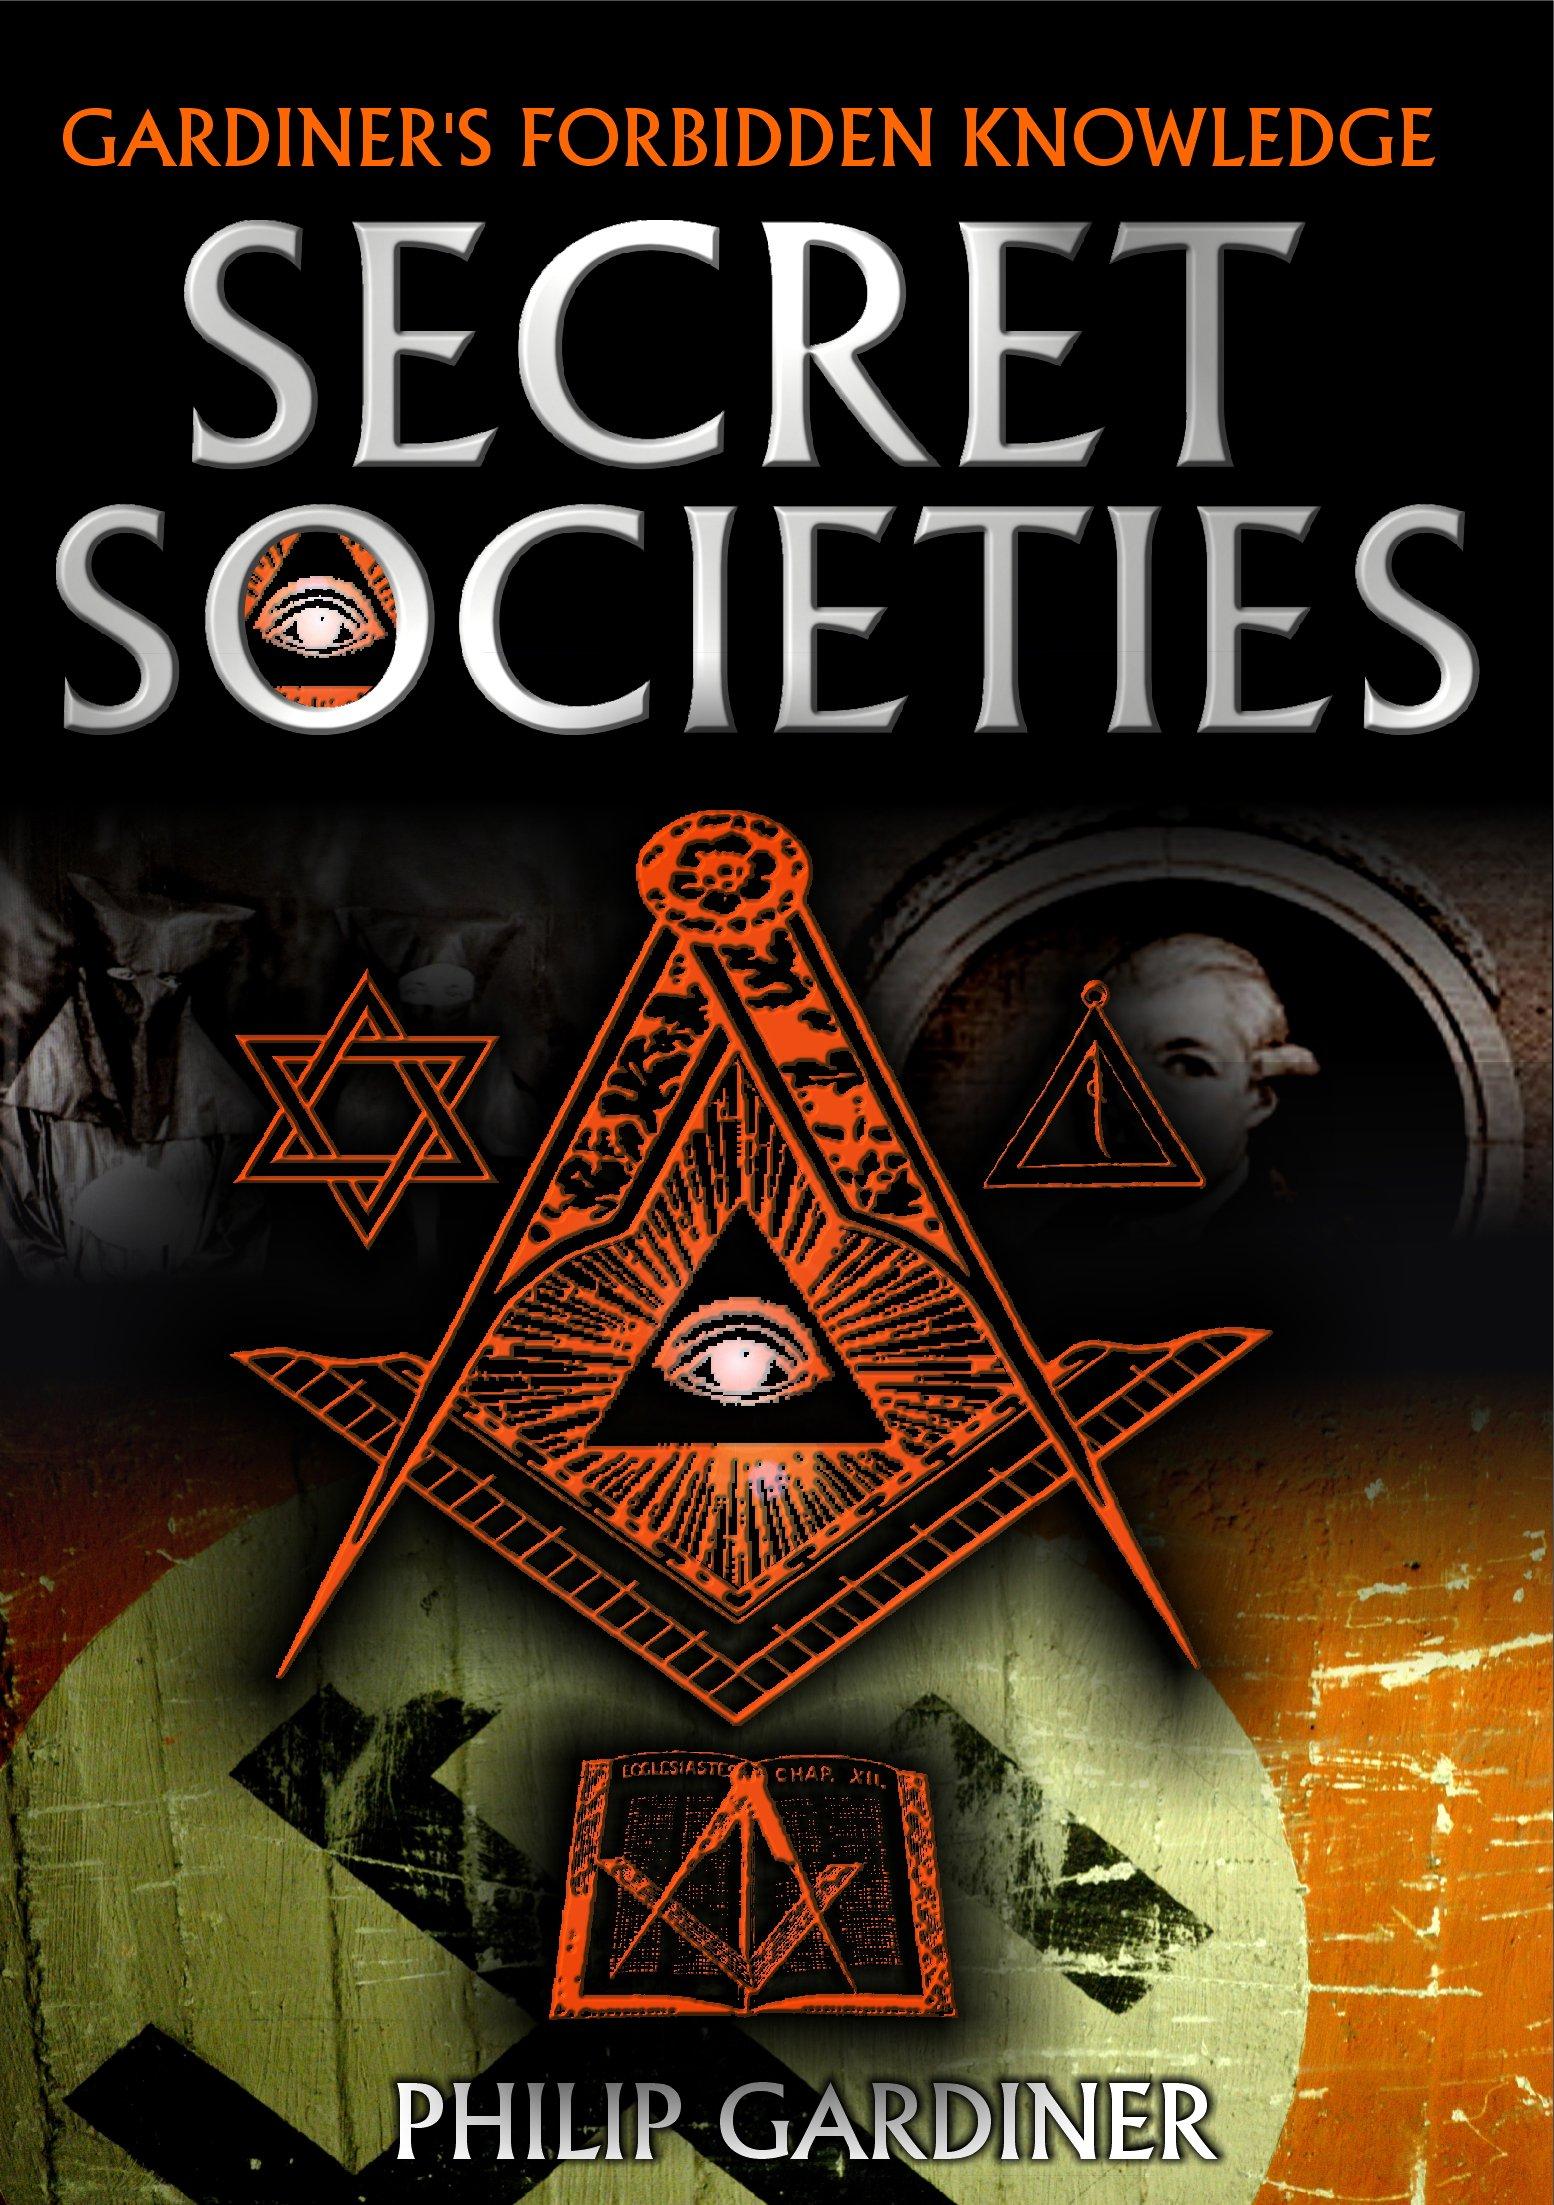 DVD : Philip Gardiner - Secret Societies (DVD)